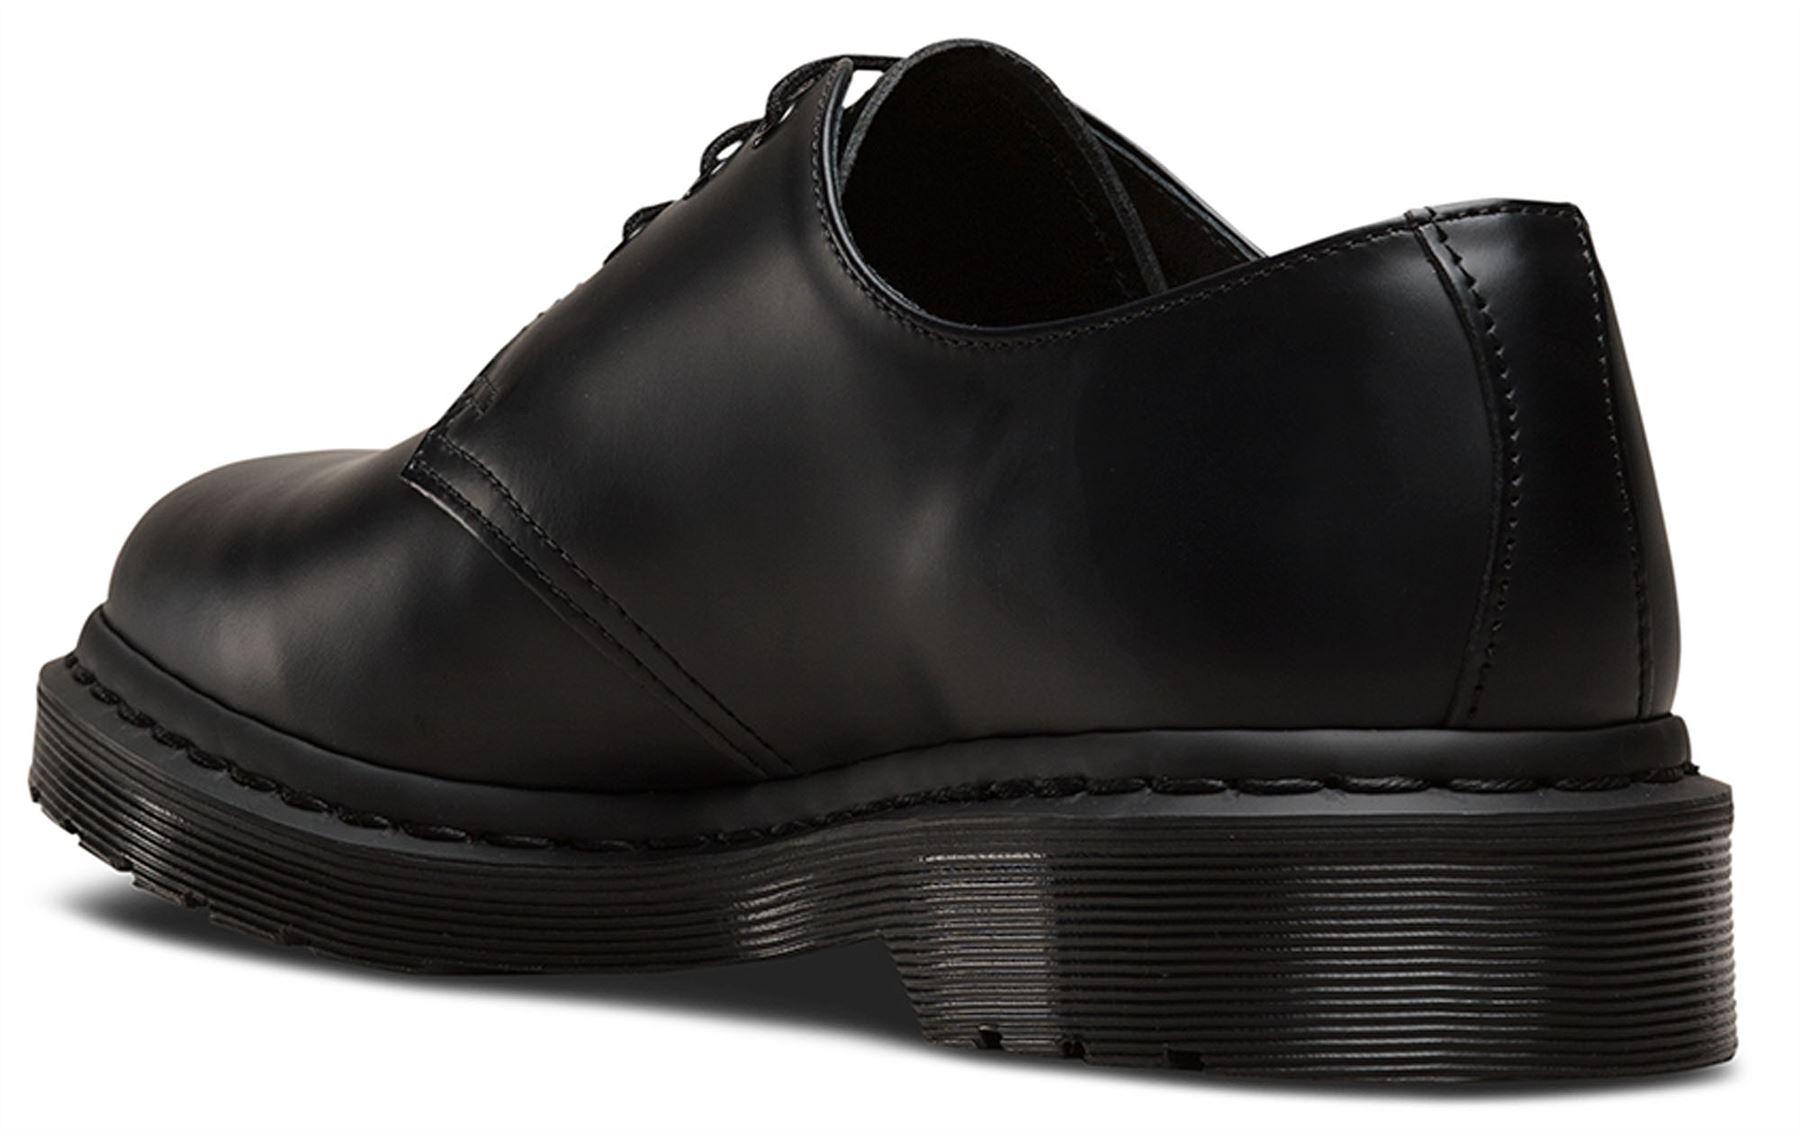 Dr Hombre Martens Hombre Dr 1461 Negro Mono Smooth Leather Zapatos 3587f8